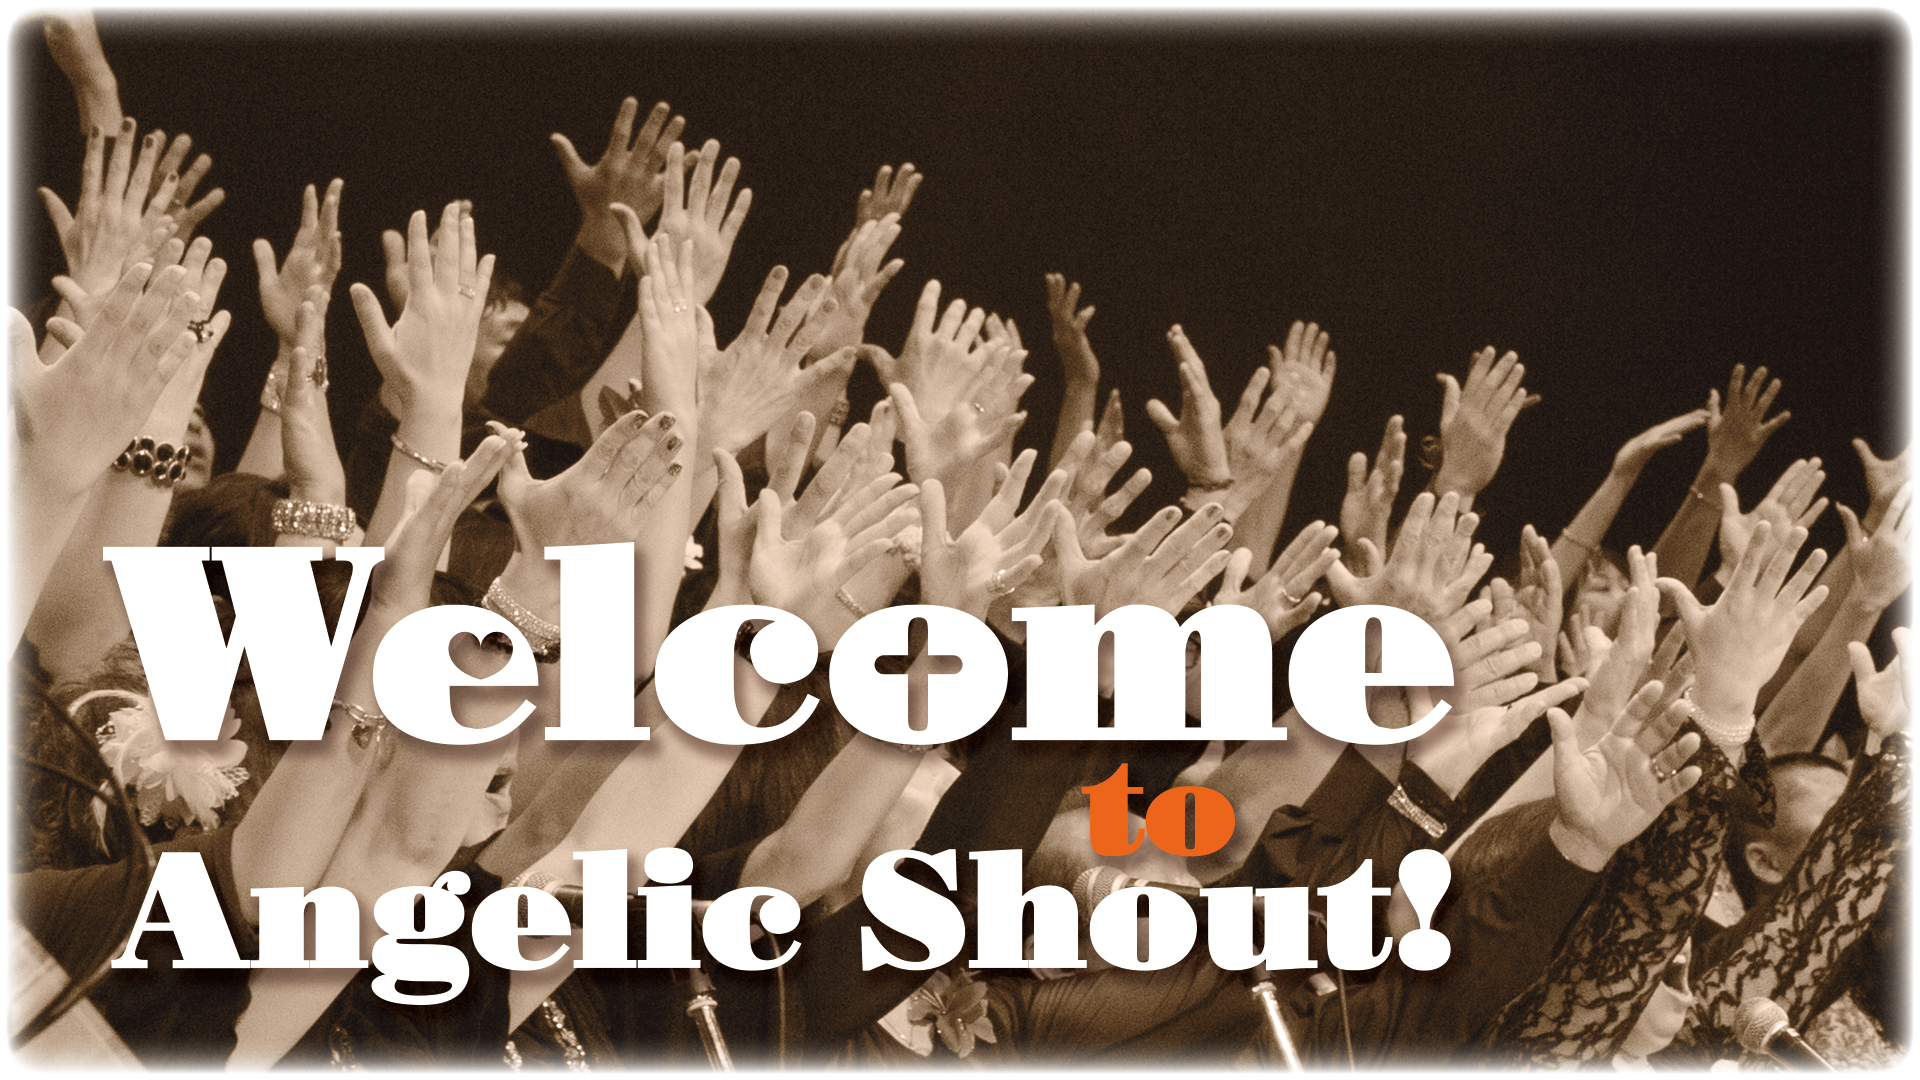 Gospel Choir Angelic Shout!